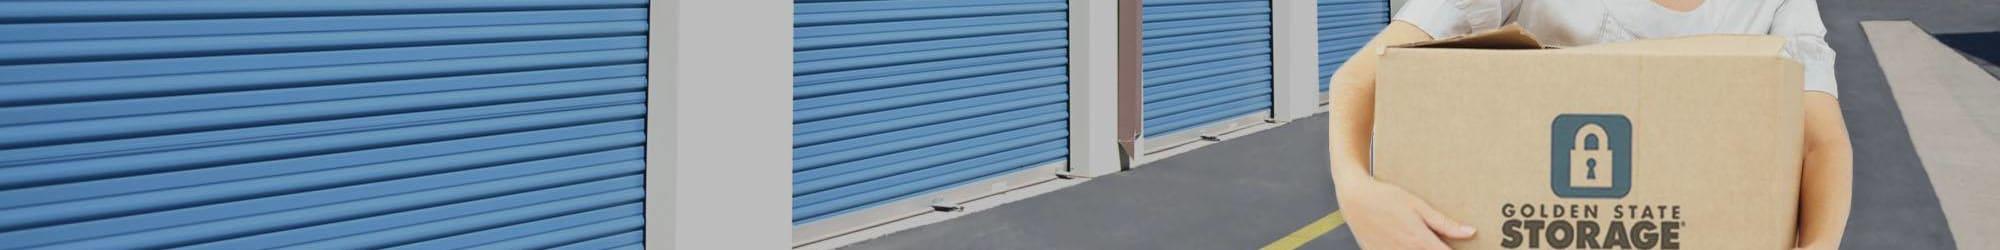 Contact Golden State Storage - Santa Fe Springs in Santa Fe Springs, California